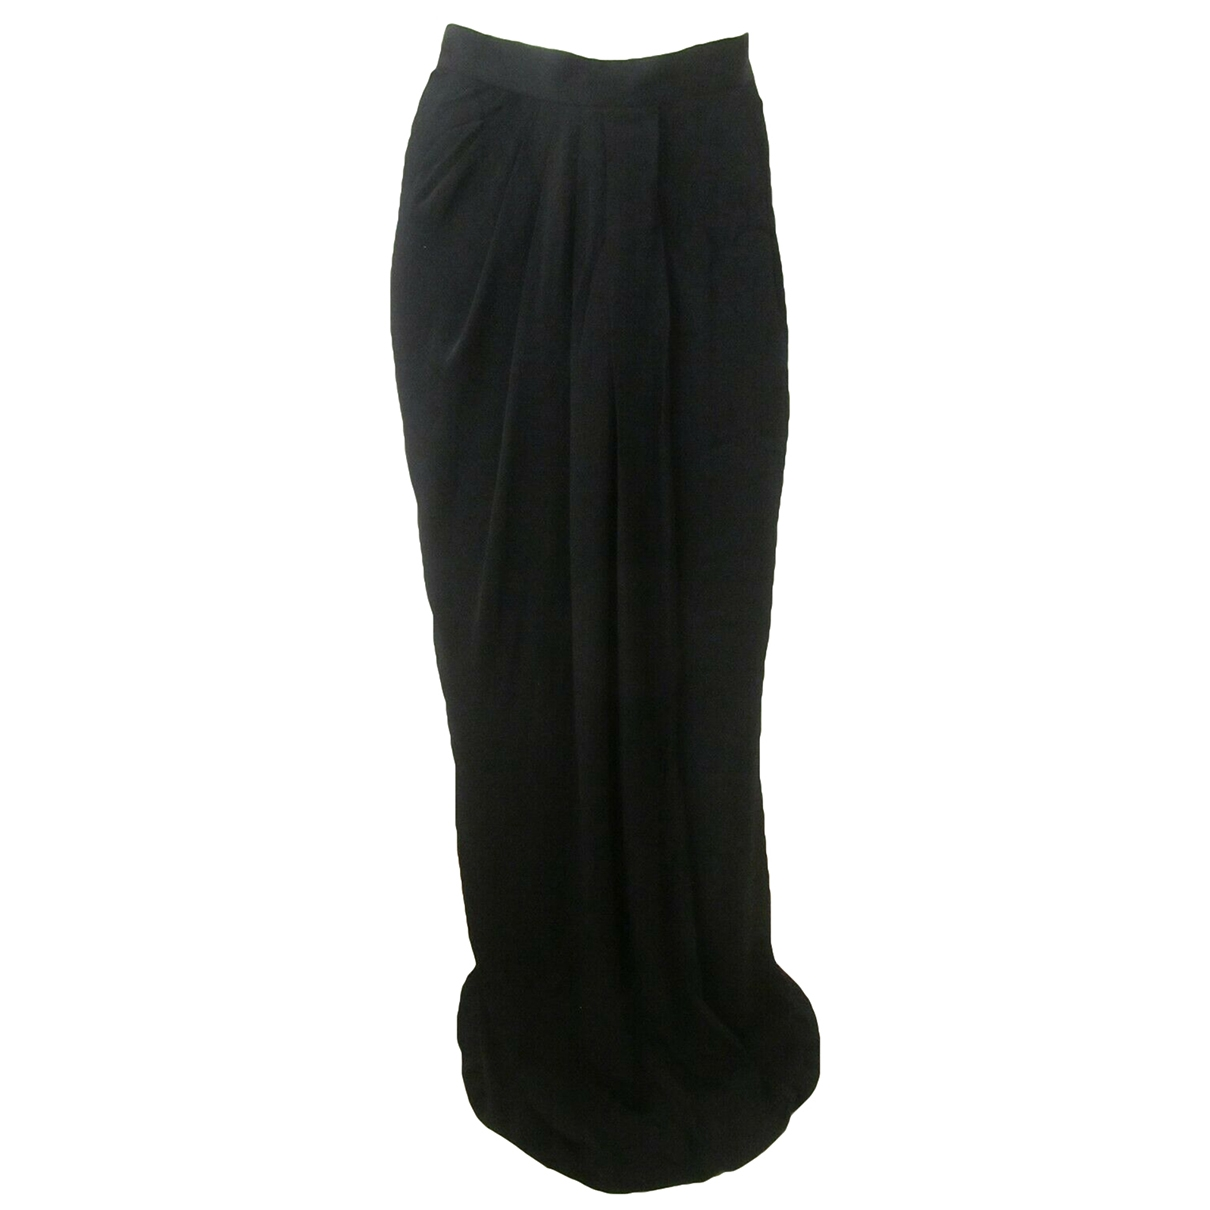 Alexander Mcqueen \N Black skirt for Women 42 IT